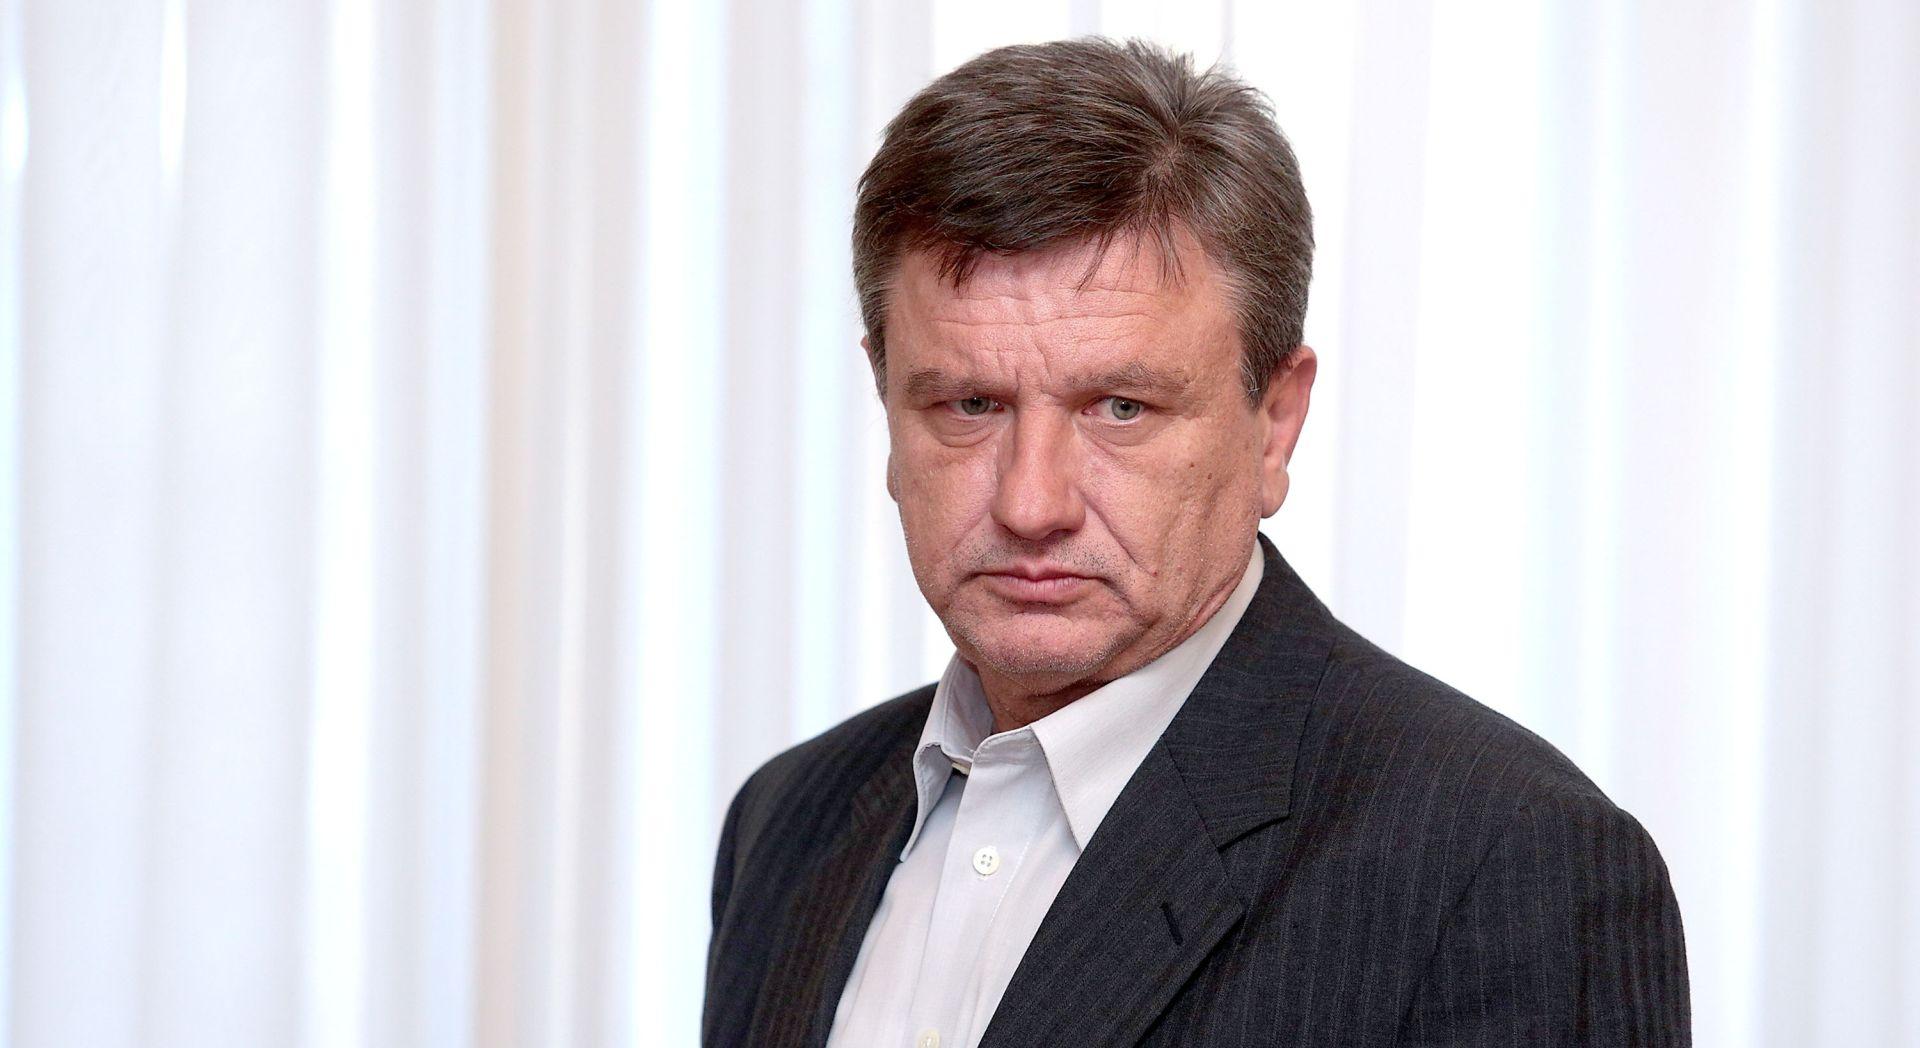 MIP odobrio kazneni postupak protiv Stjepana Pintarića (HDZ)